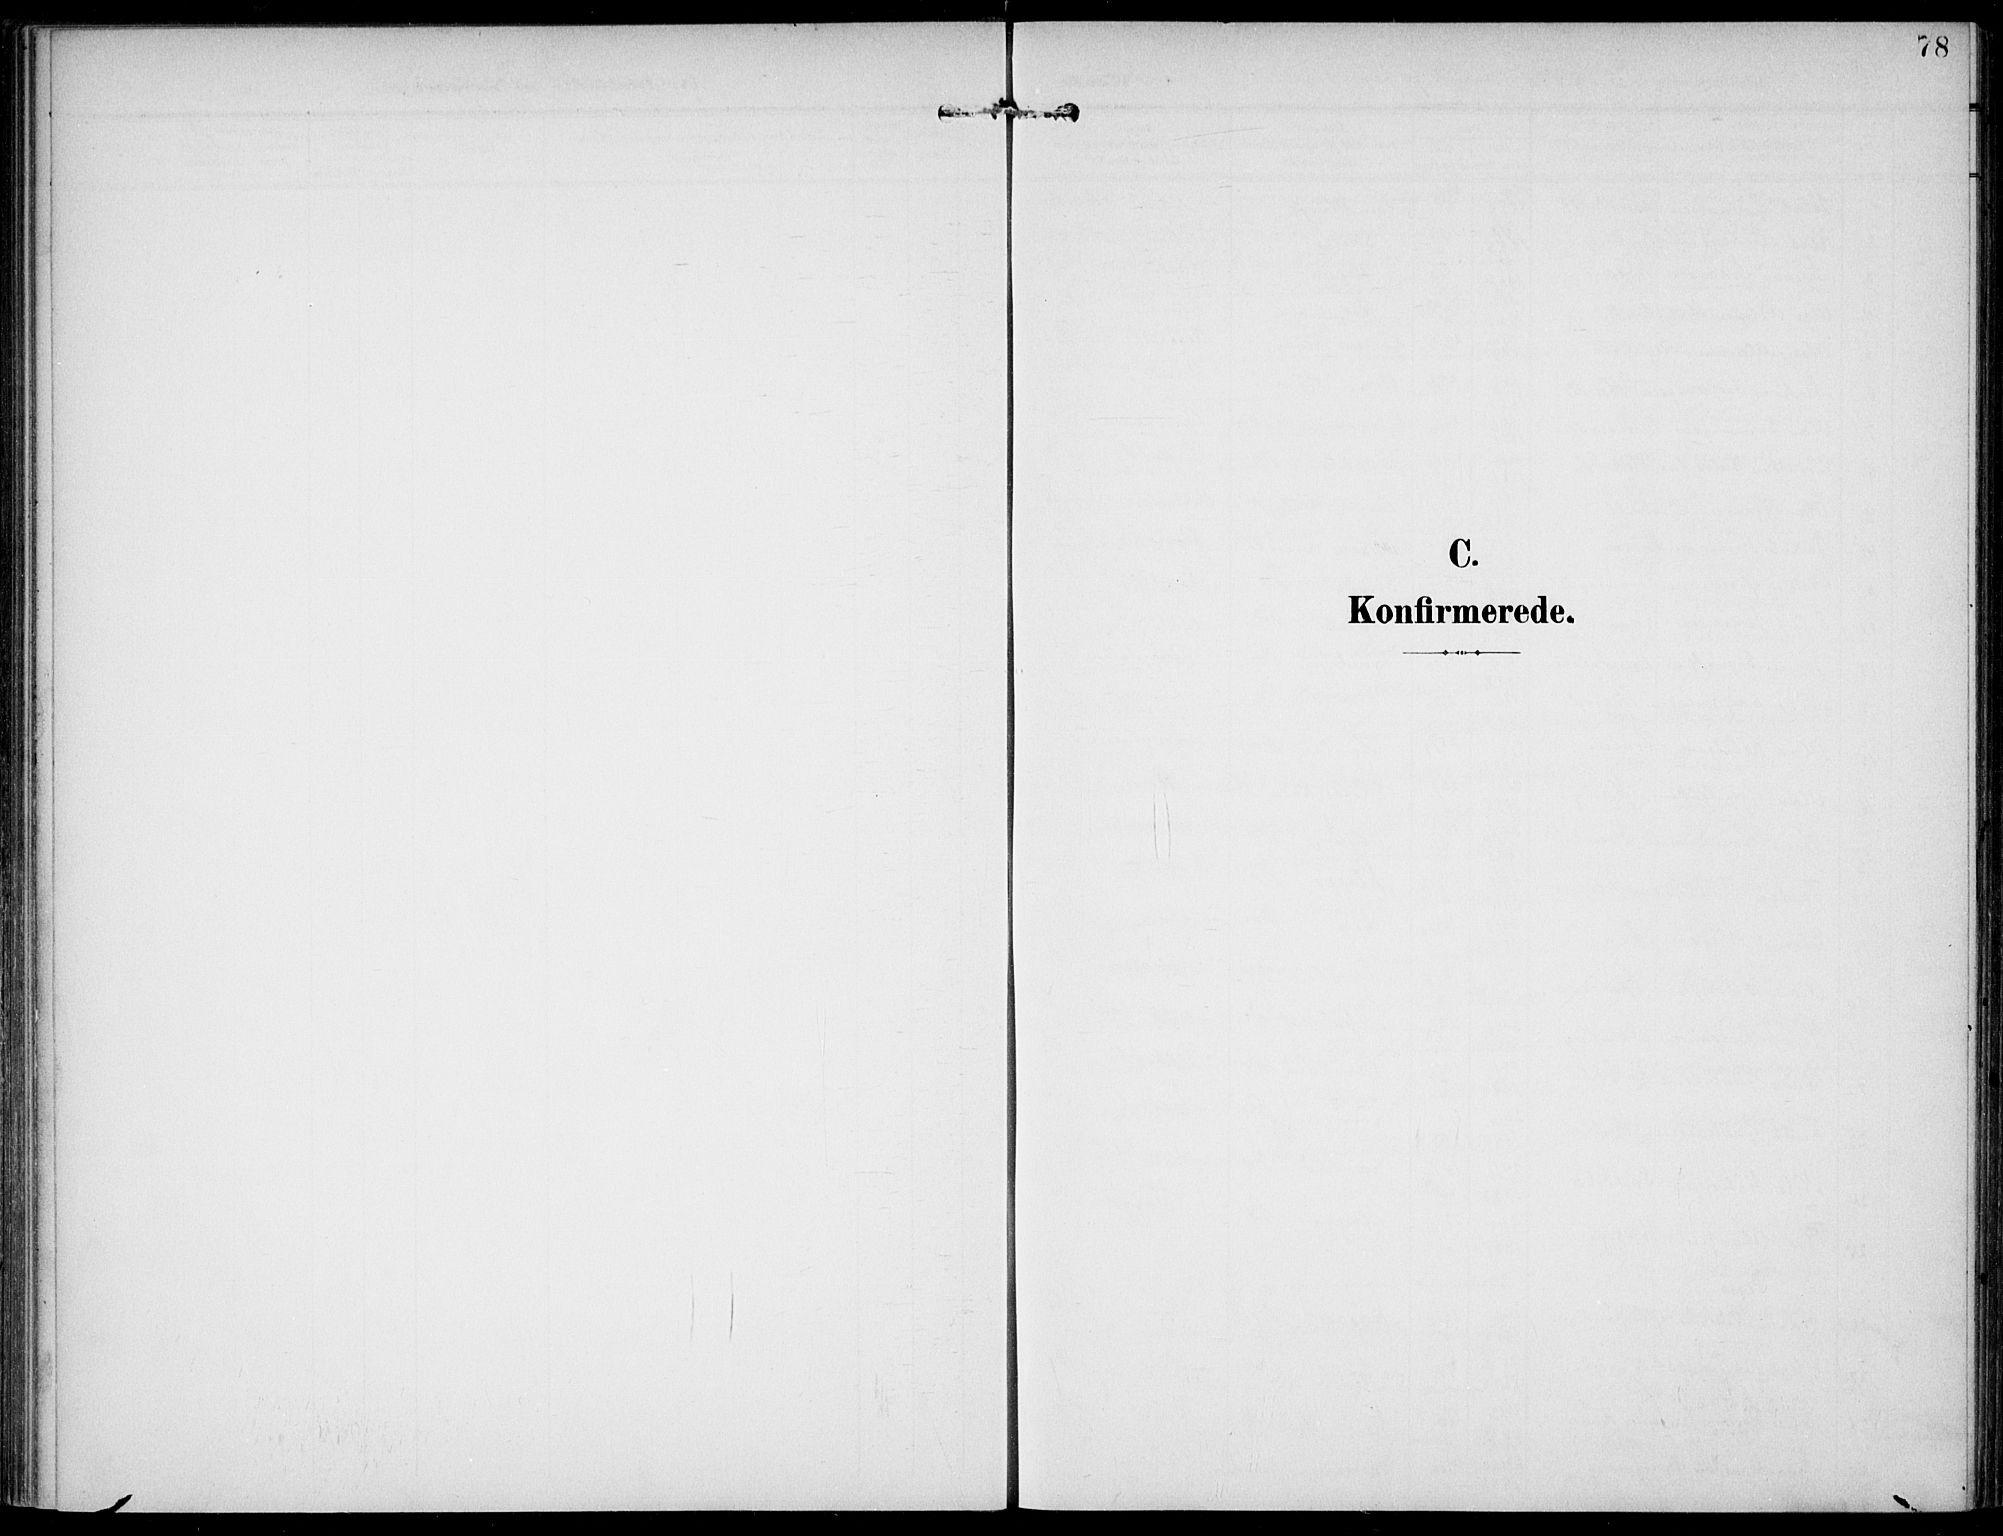 SAKO, Lunde kirkebøker, F/Fa/L0004: Ministerialbok nr. I 4, 1902-1913, s. 78